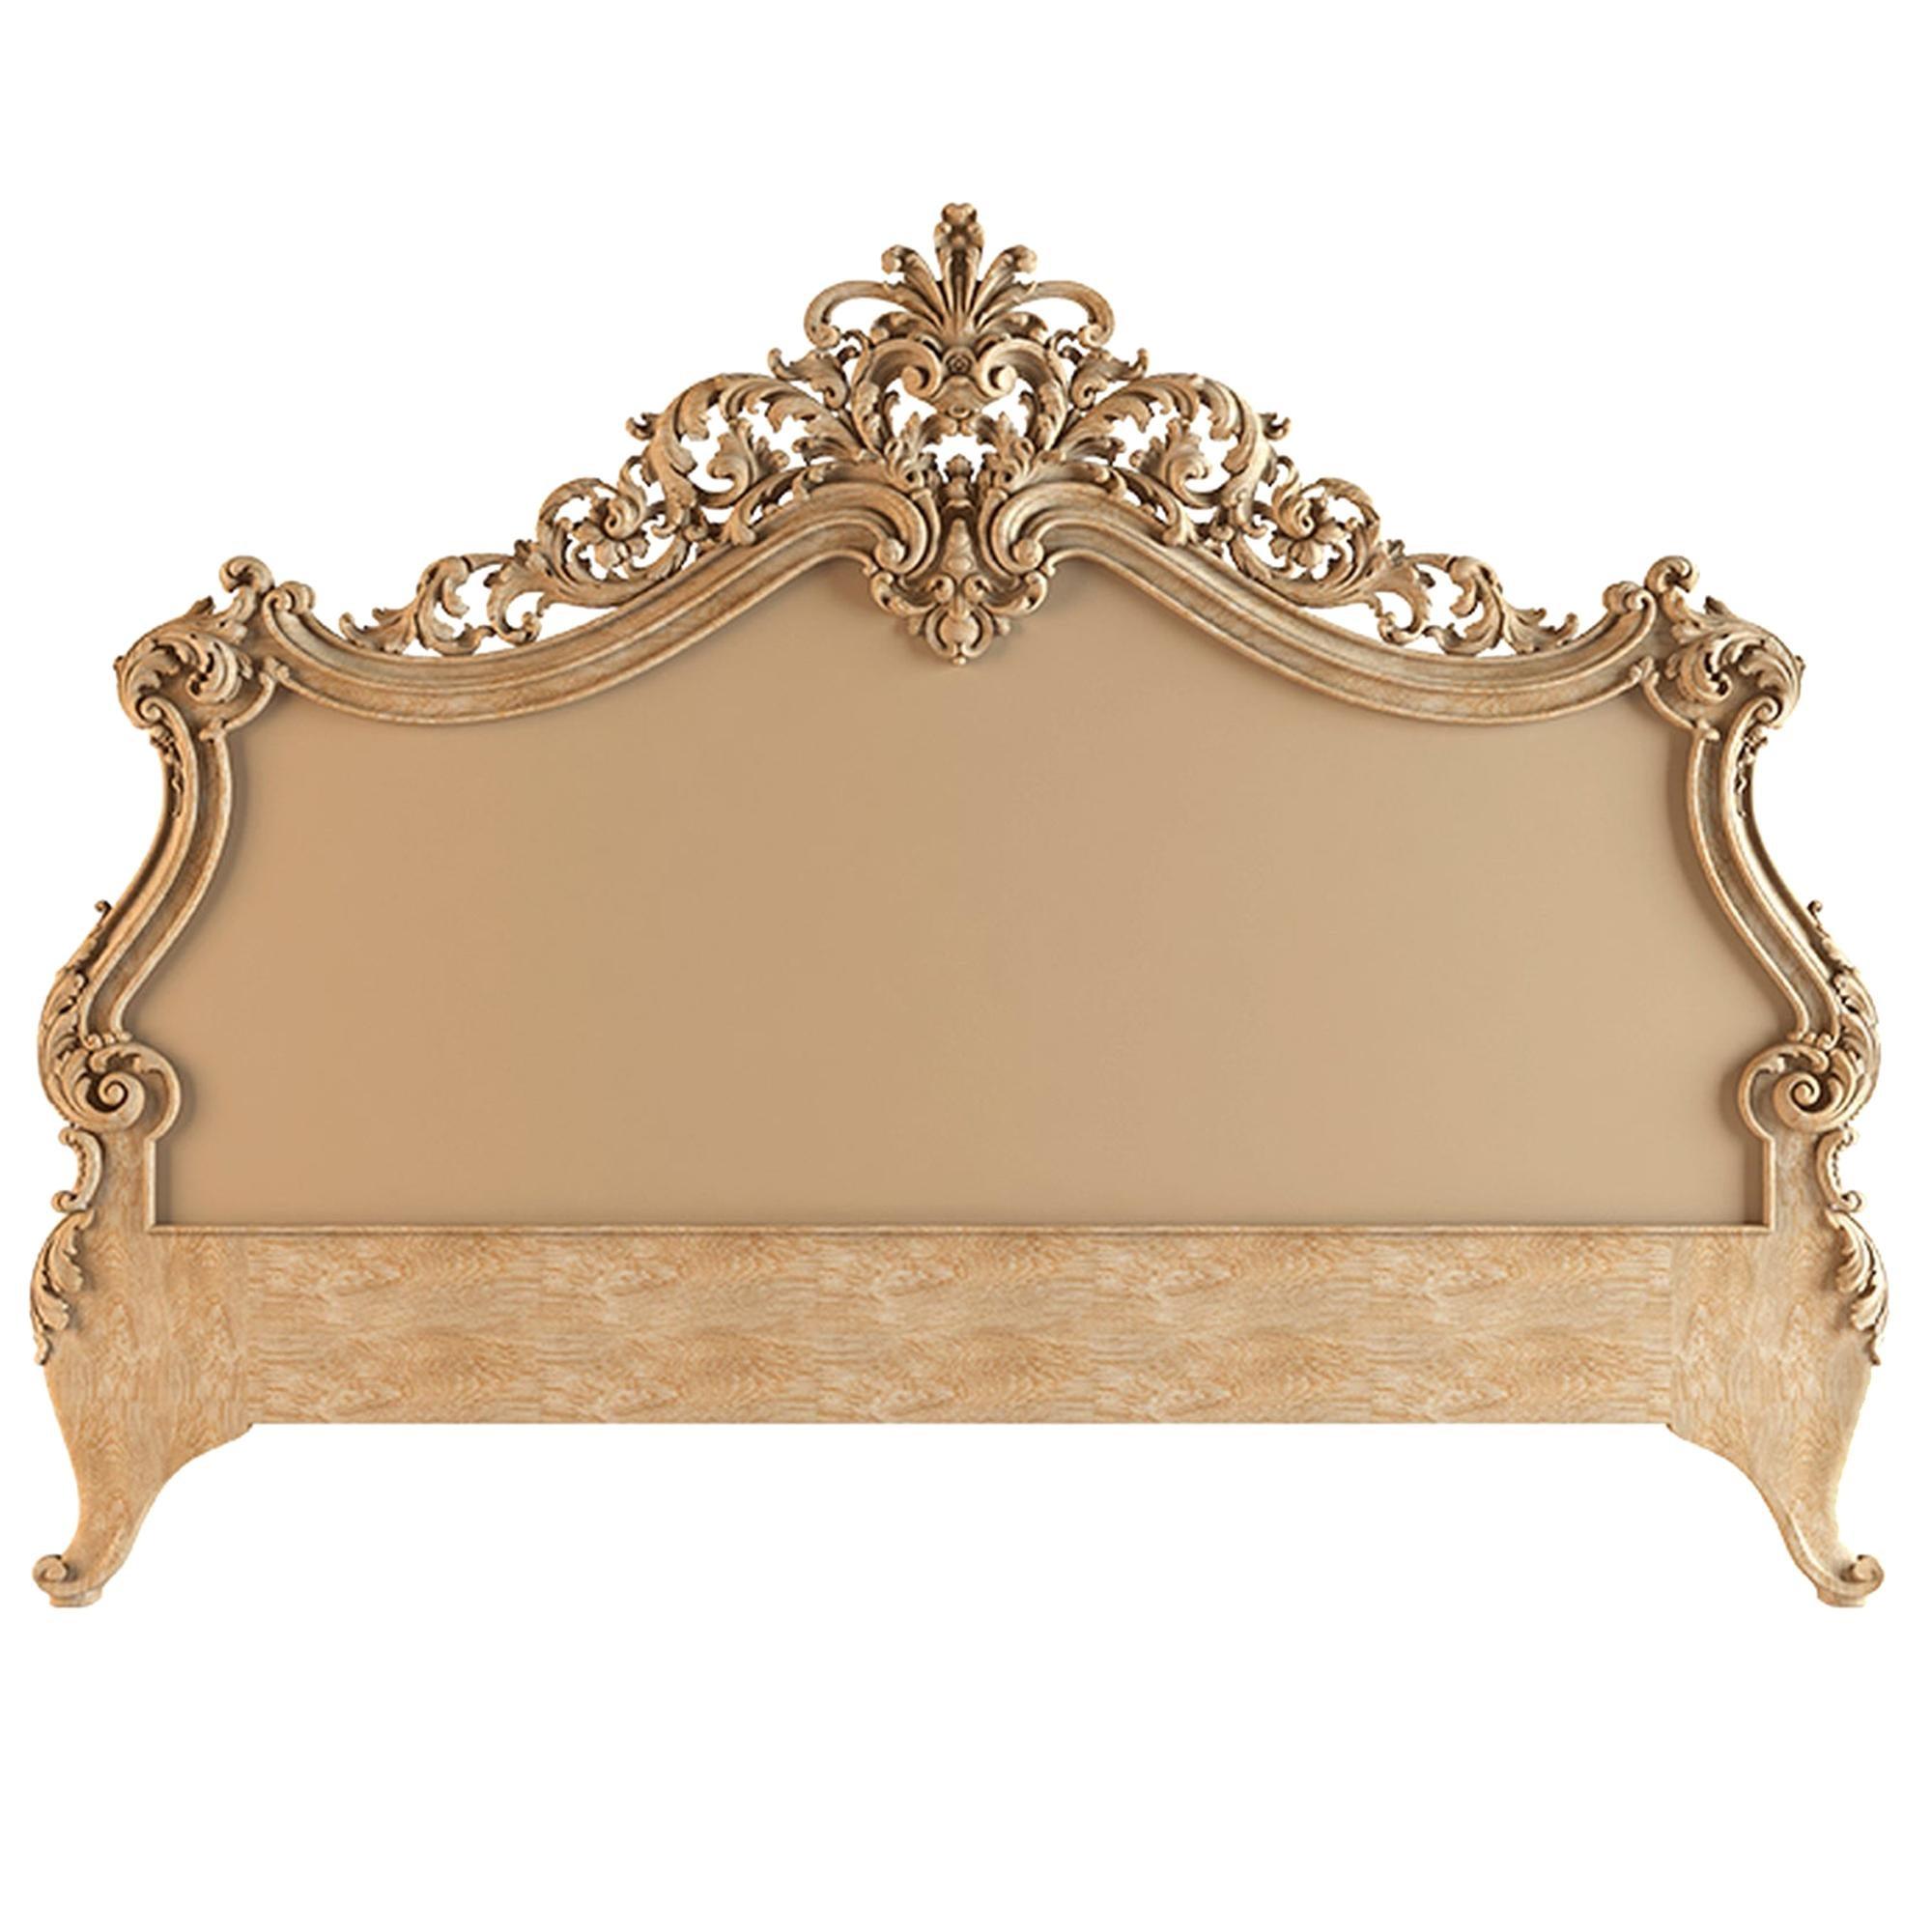 Baroque Headboard for Bed from Oak or Beech